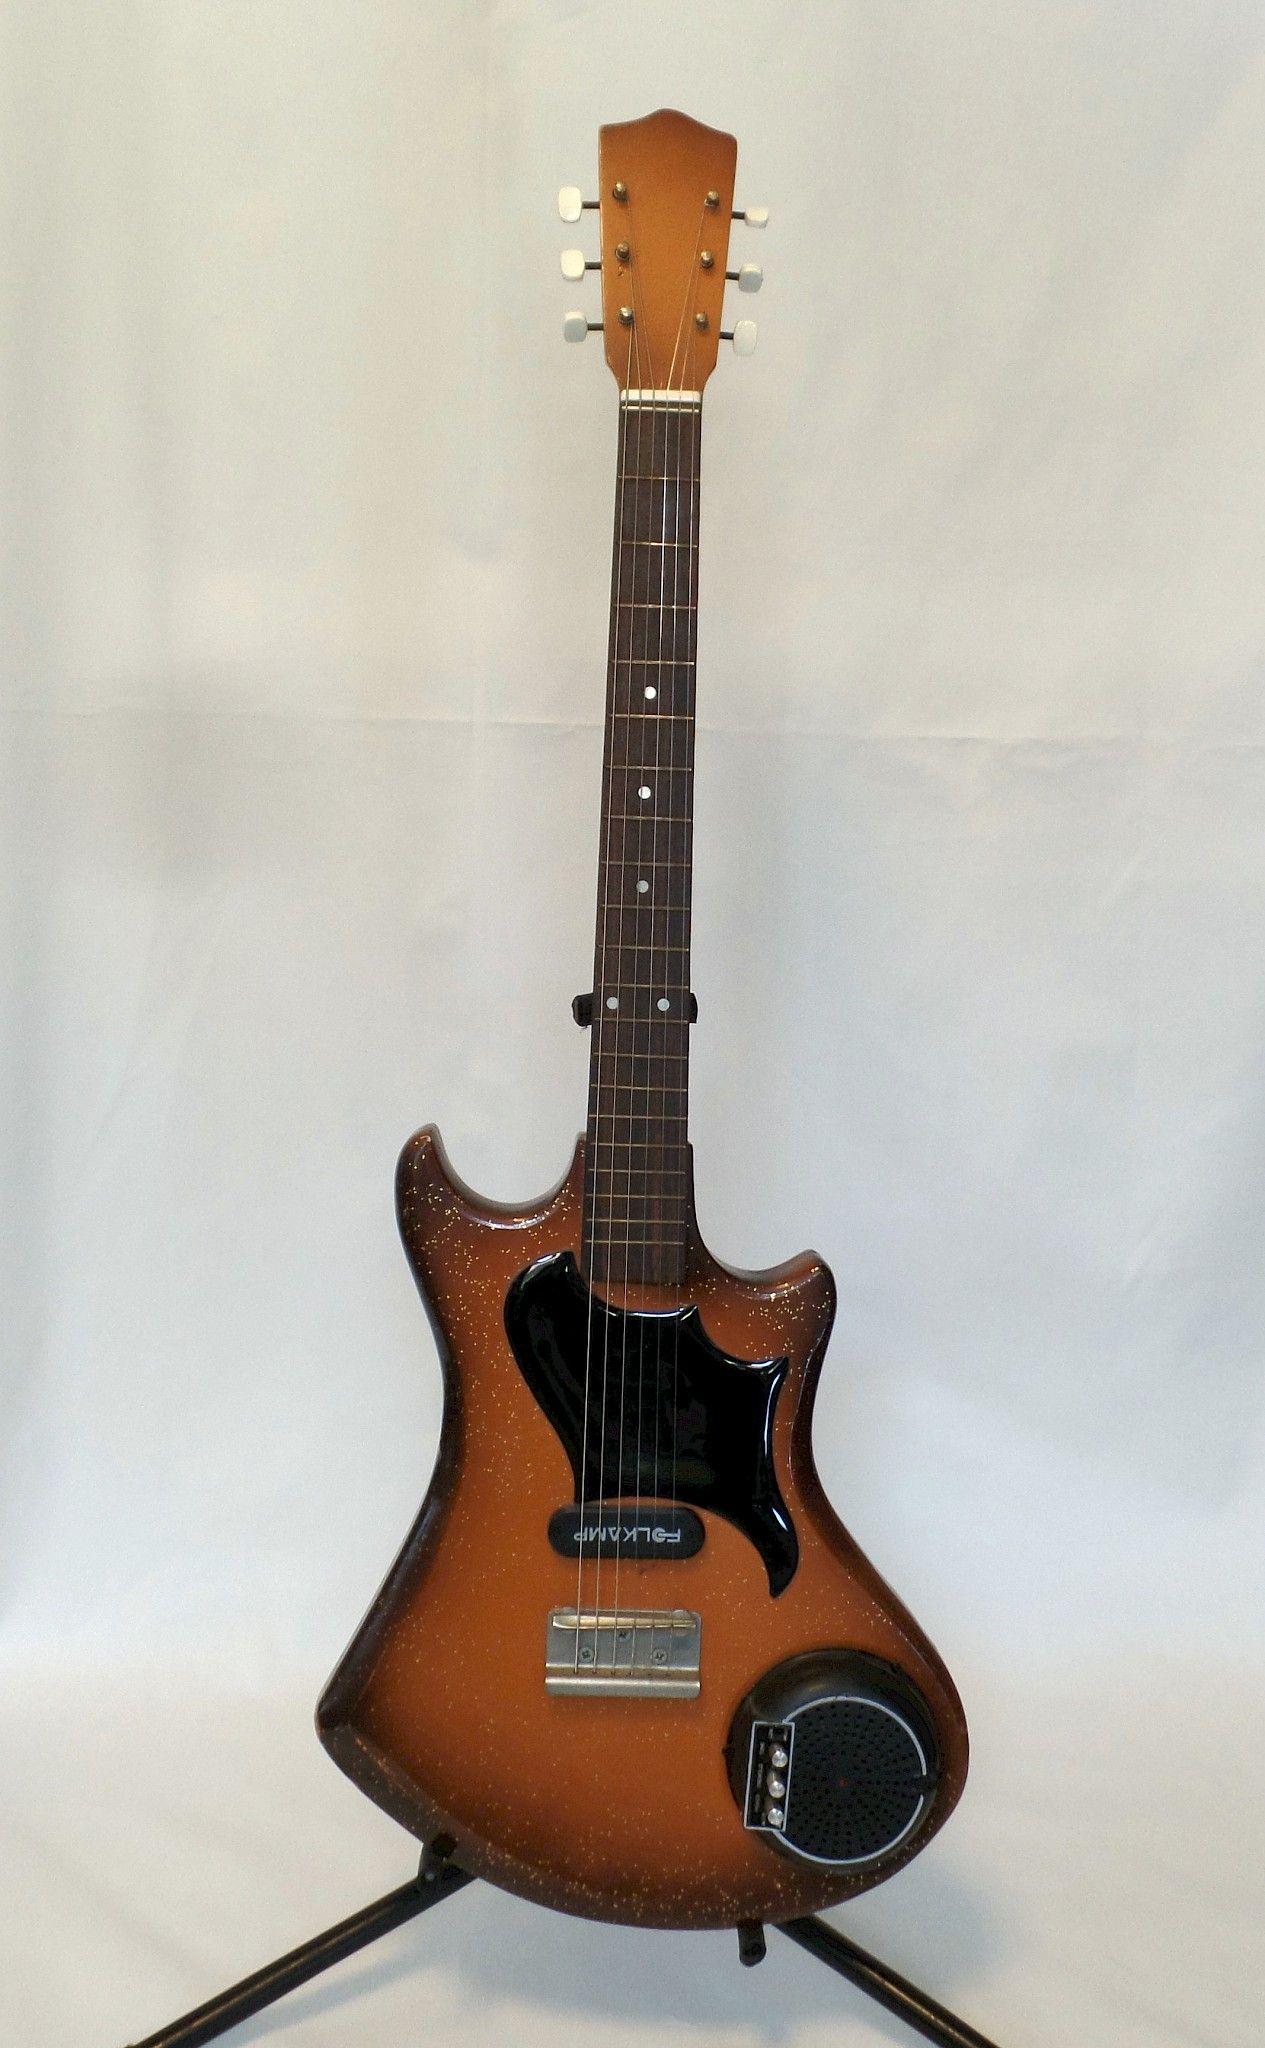 Huttl Folkamp Guitar Guitarage Nl Guitar Crazy Crazy Guitars In 2020 Guitar Guitar Design Electric Guitar